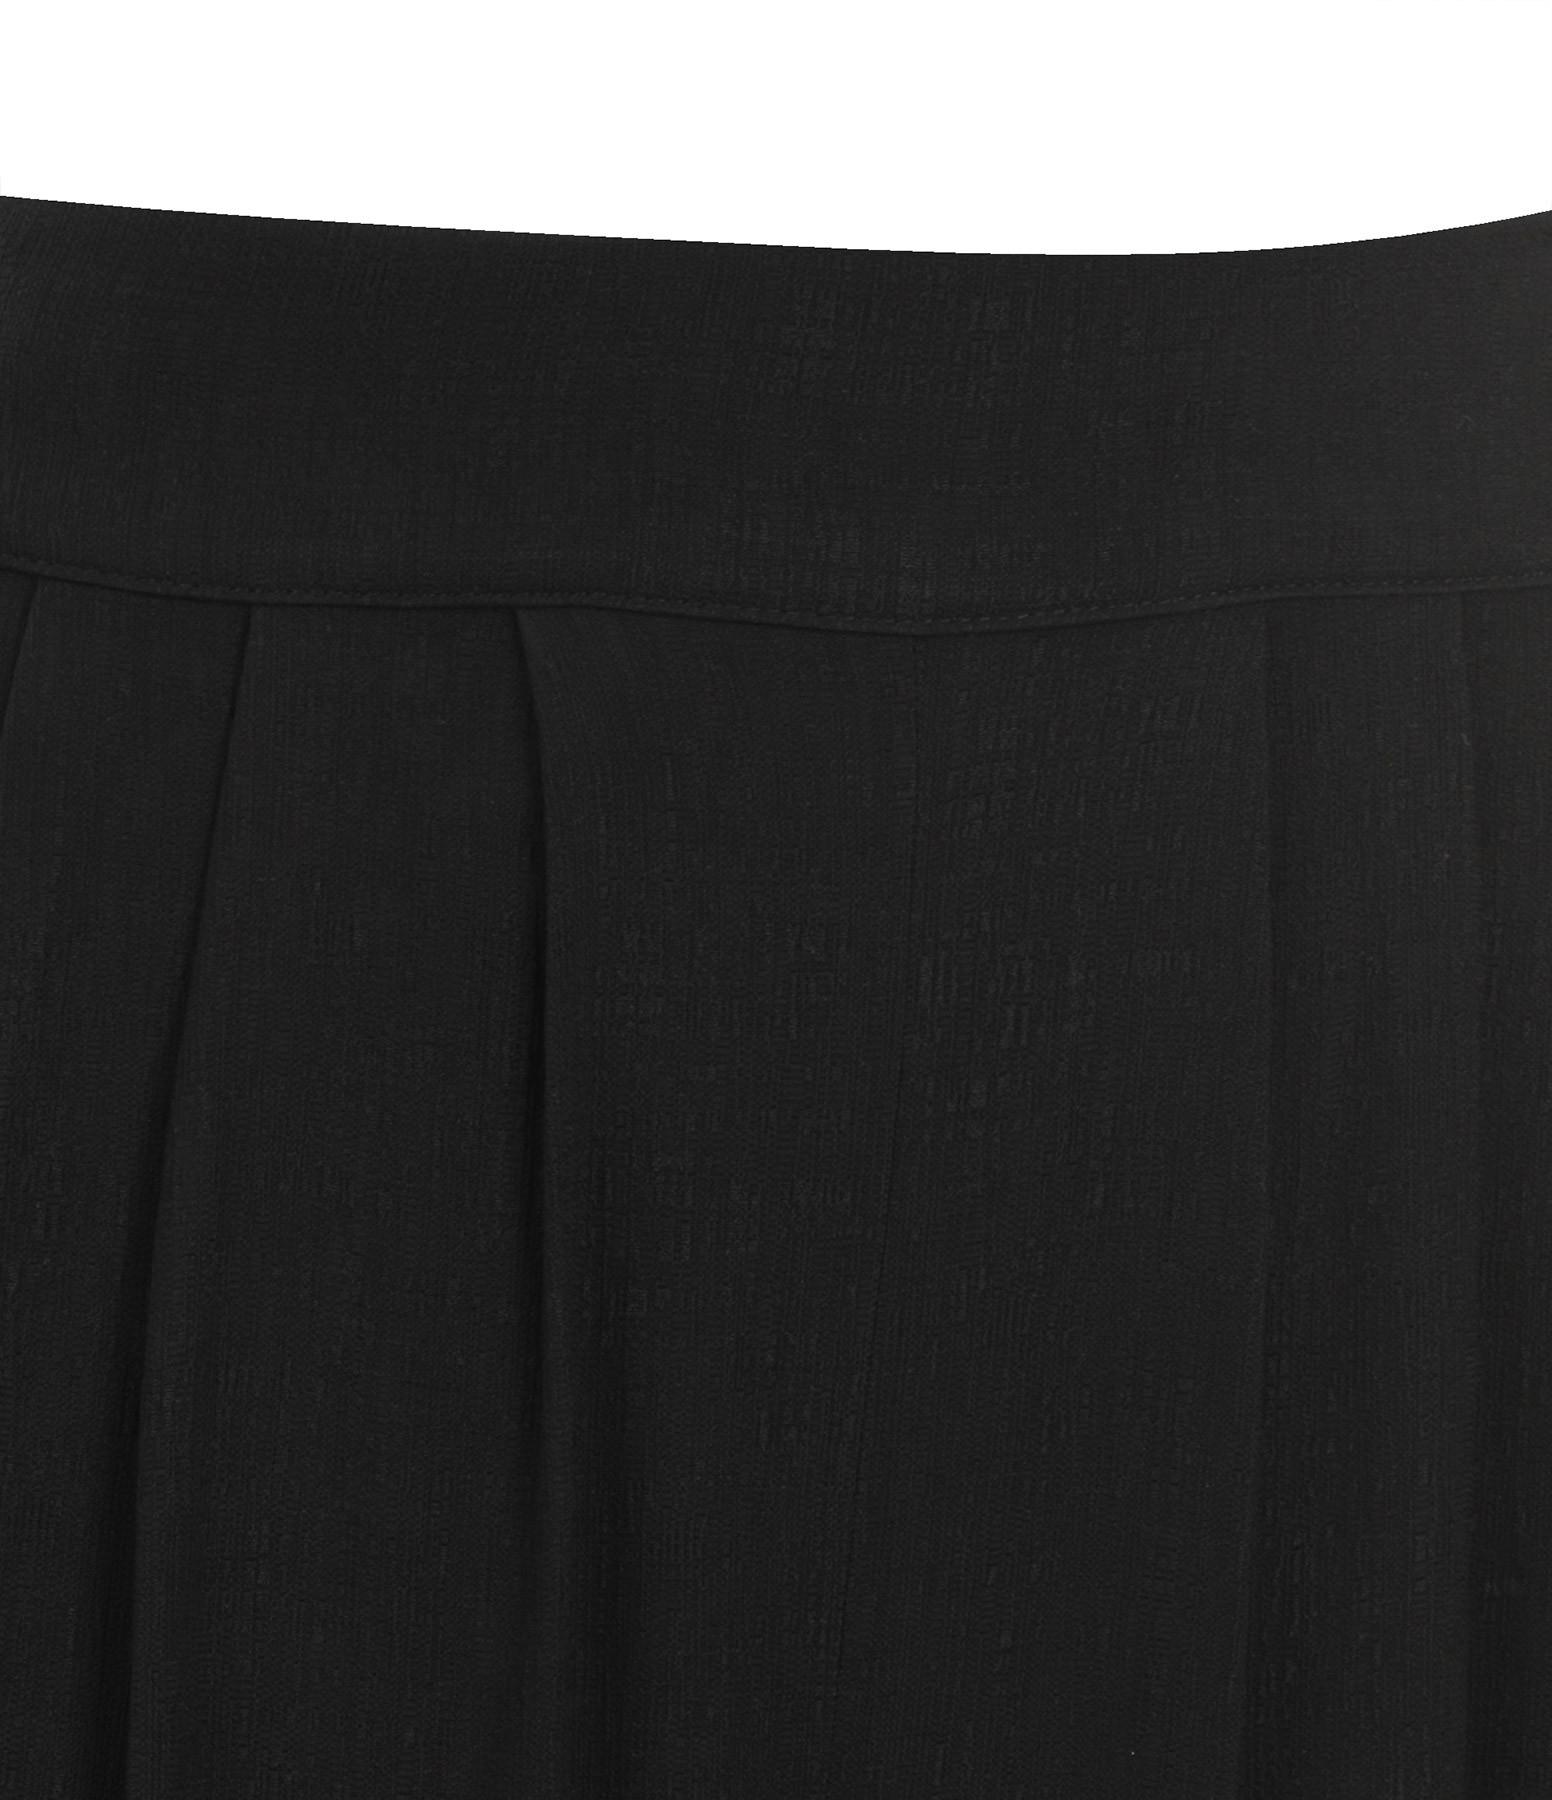 VANESSA BRUNO - Pantalon Nunes Noir